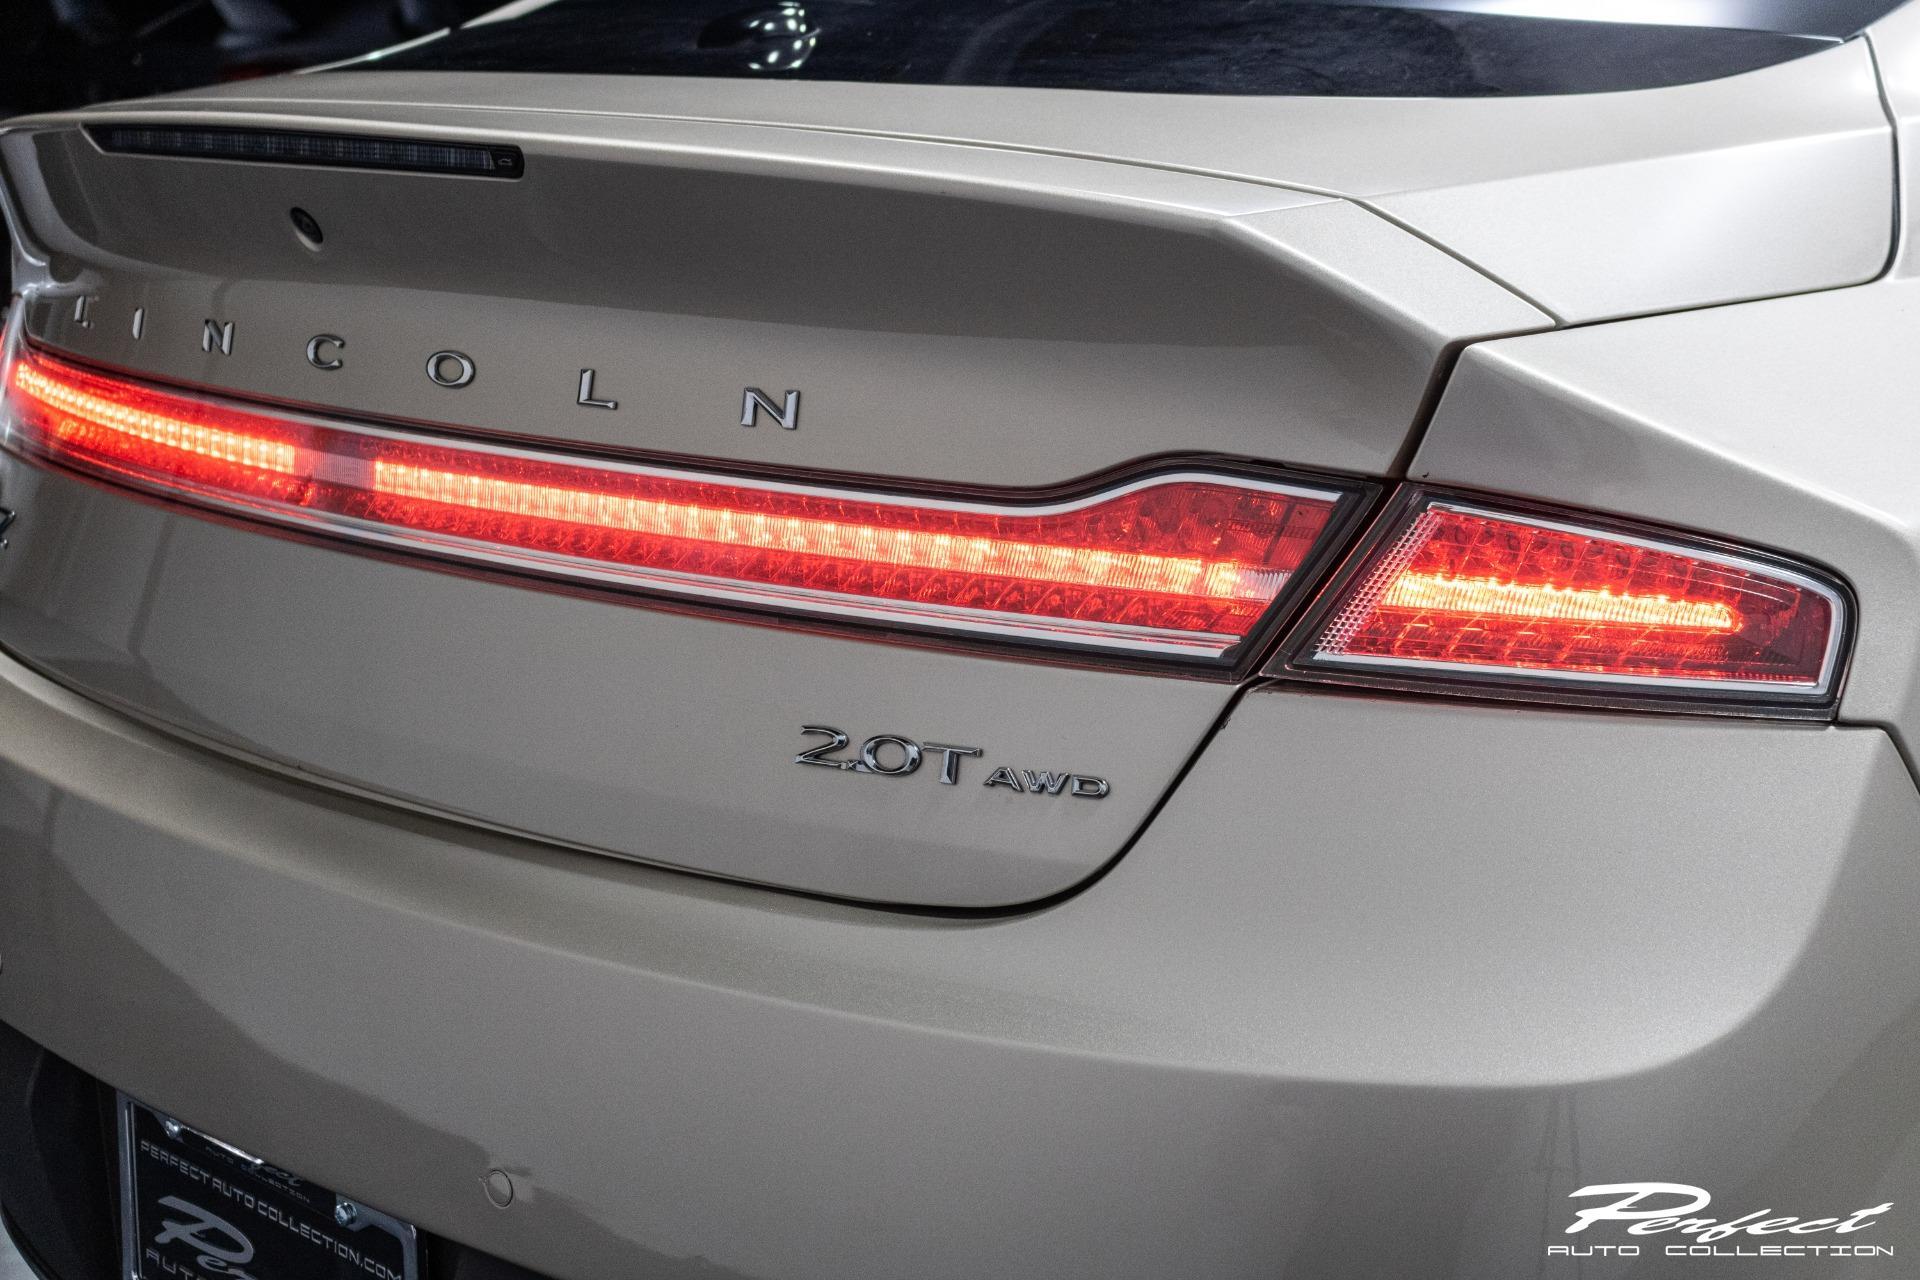 Used 2017 Lincoln MKZ Premiere